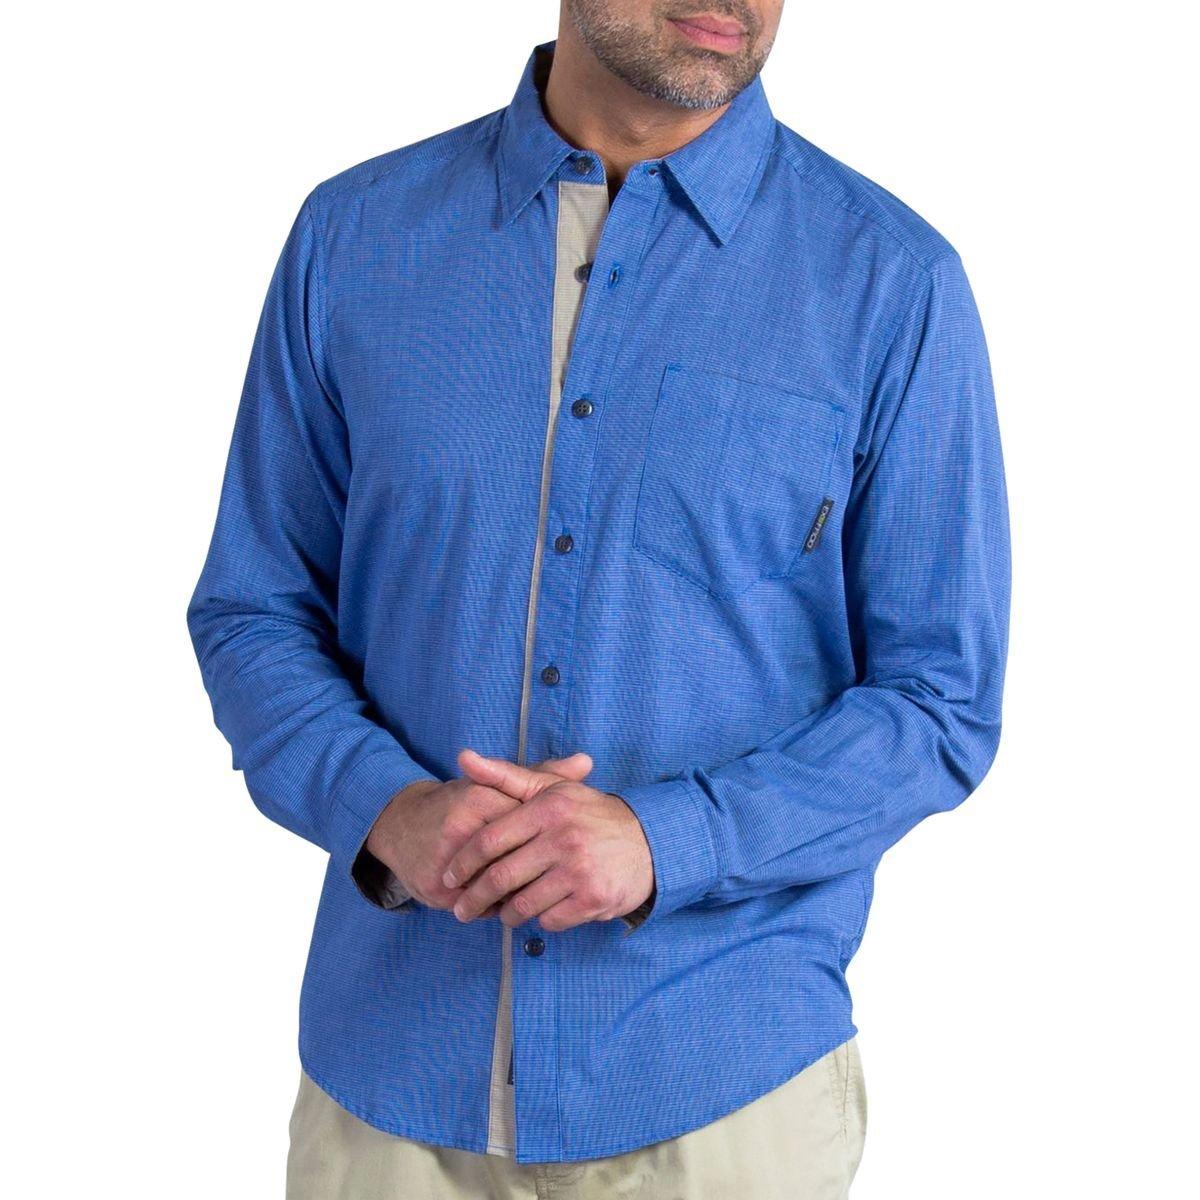 mosquito-repellent-clothing-mens